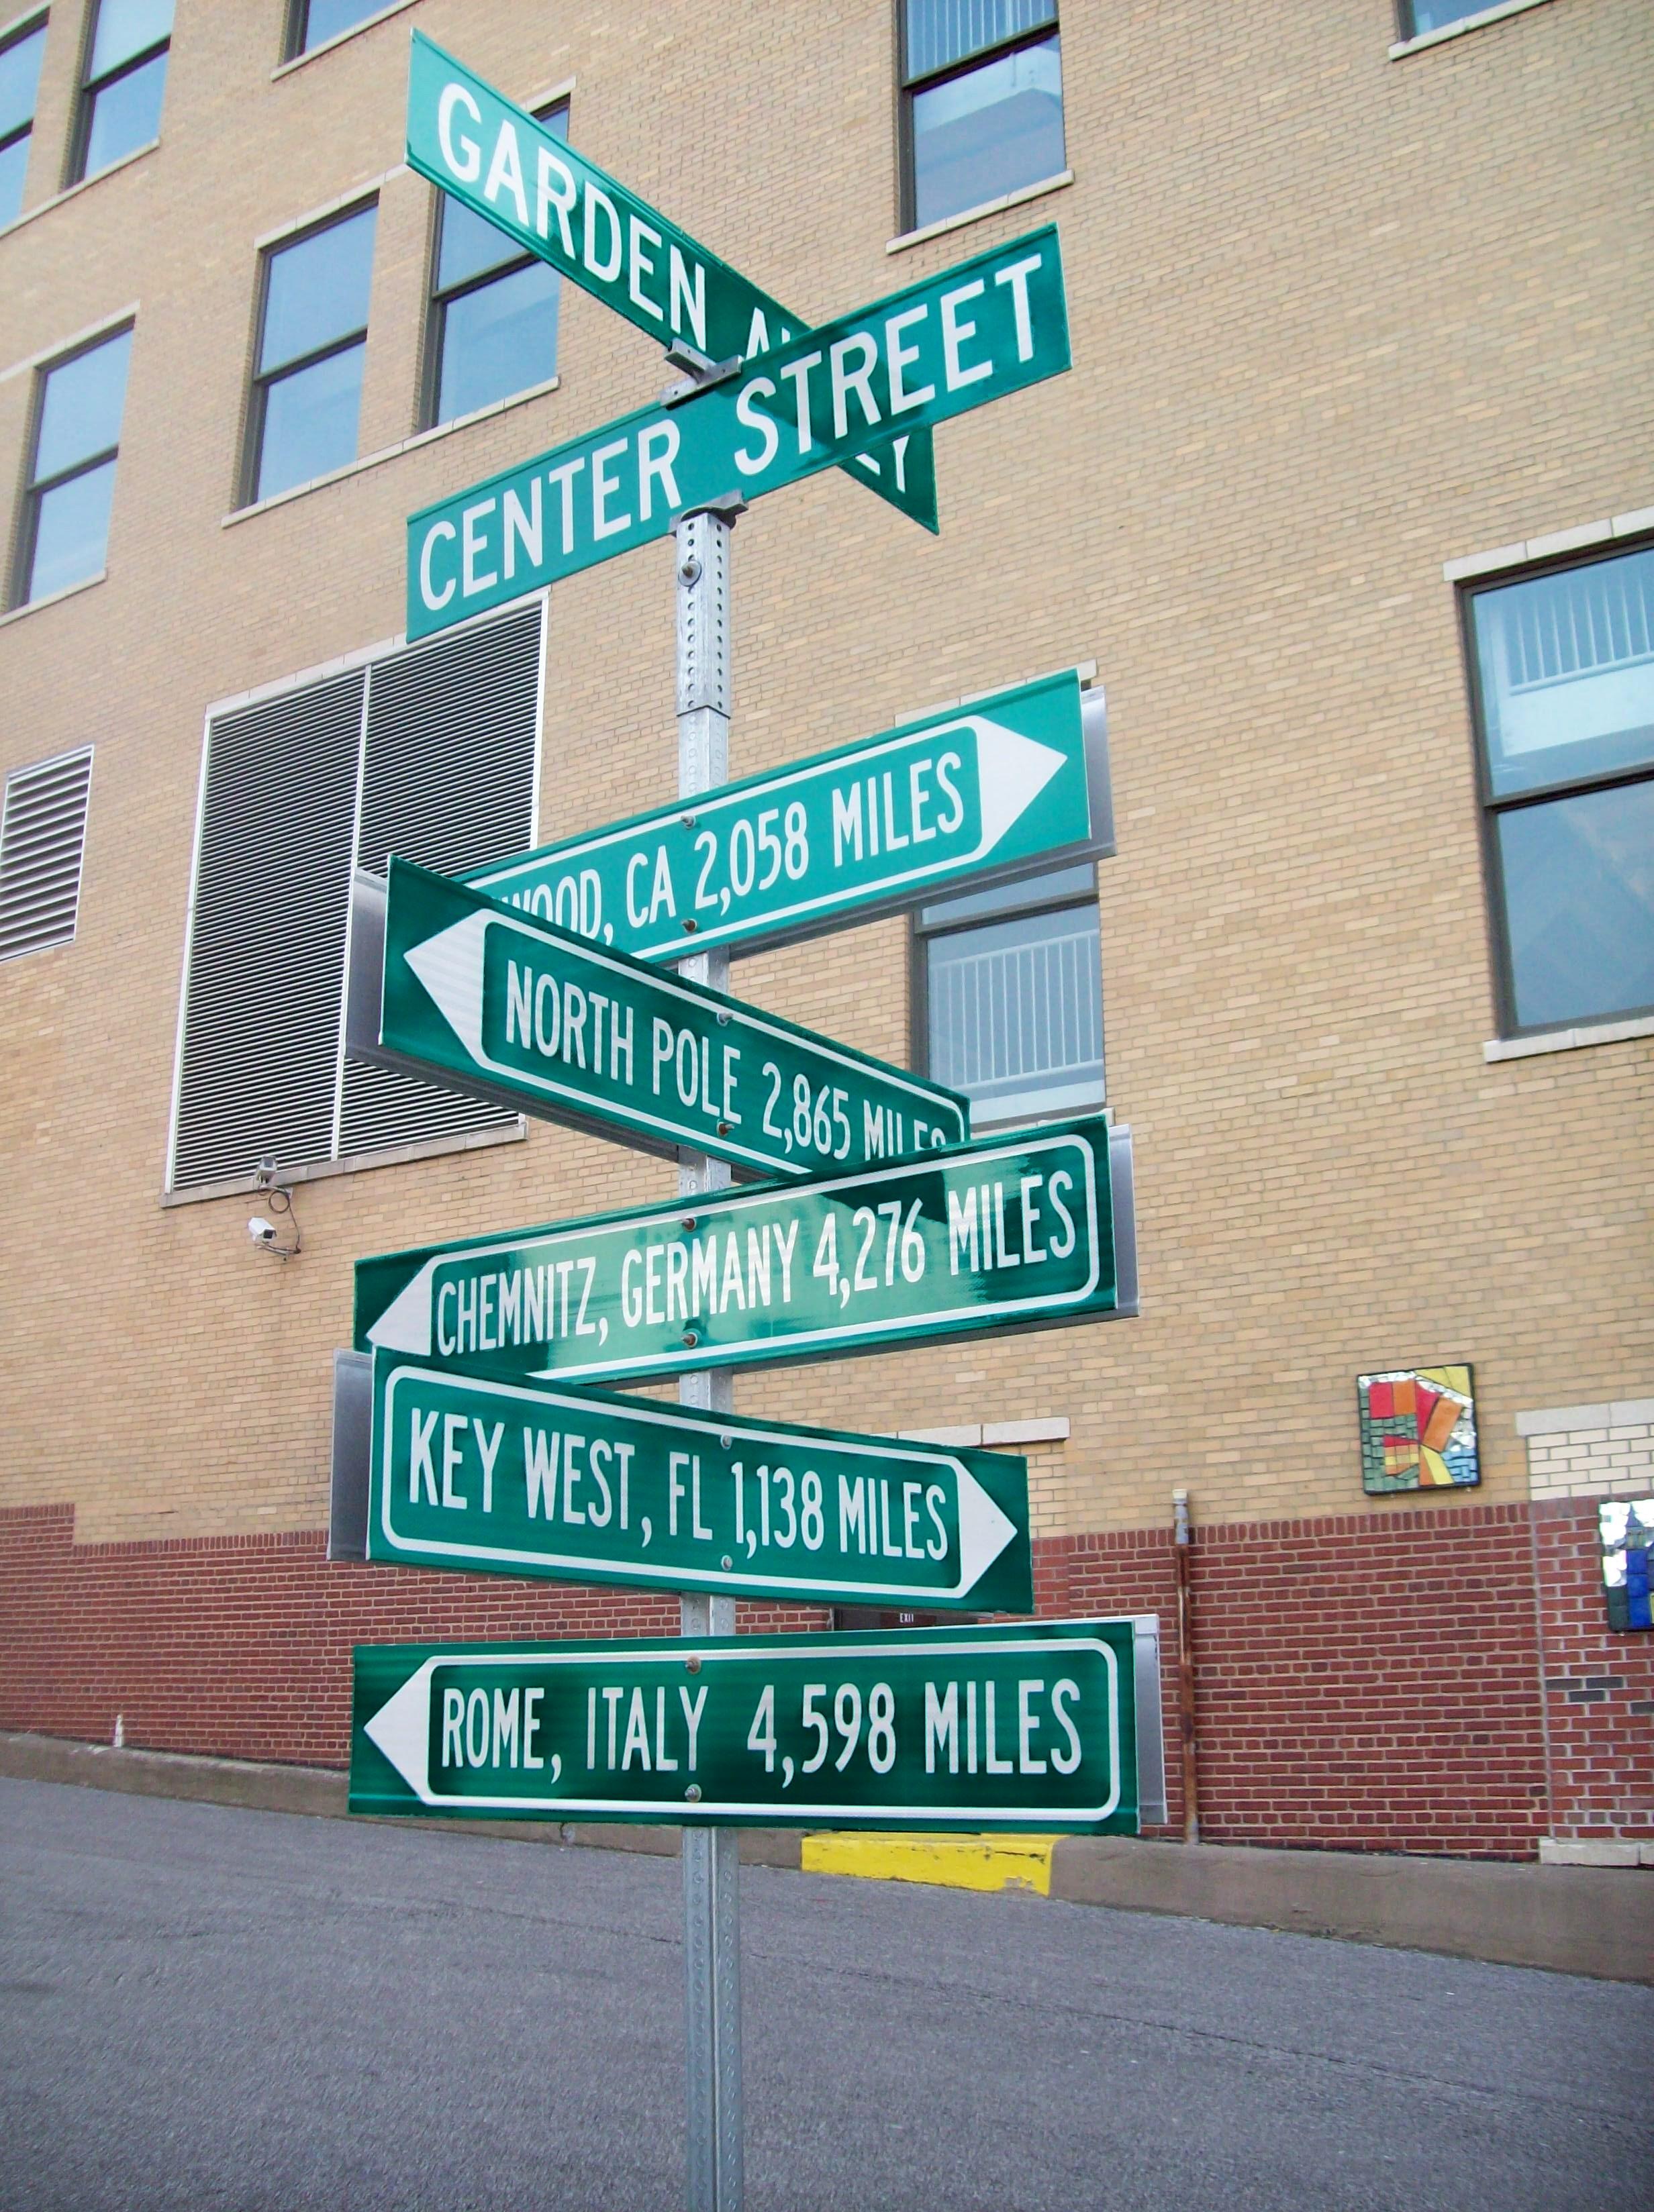 Global street sign Akron Ohio Familypedia